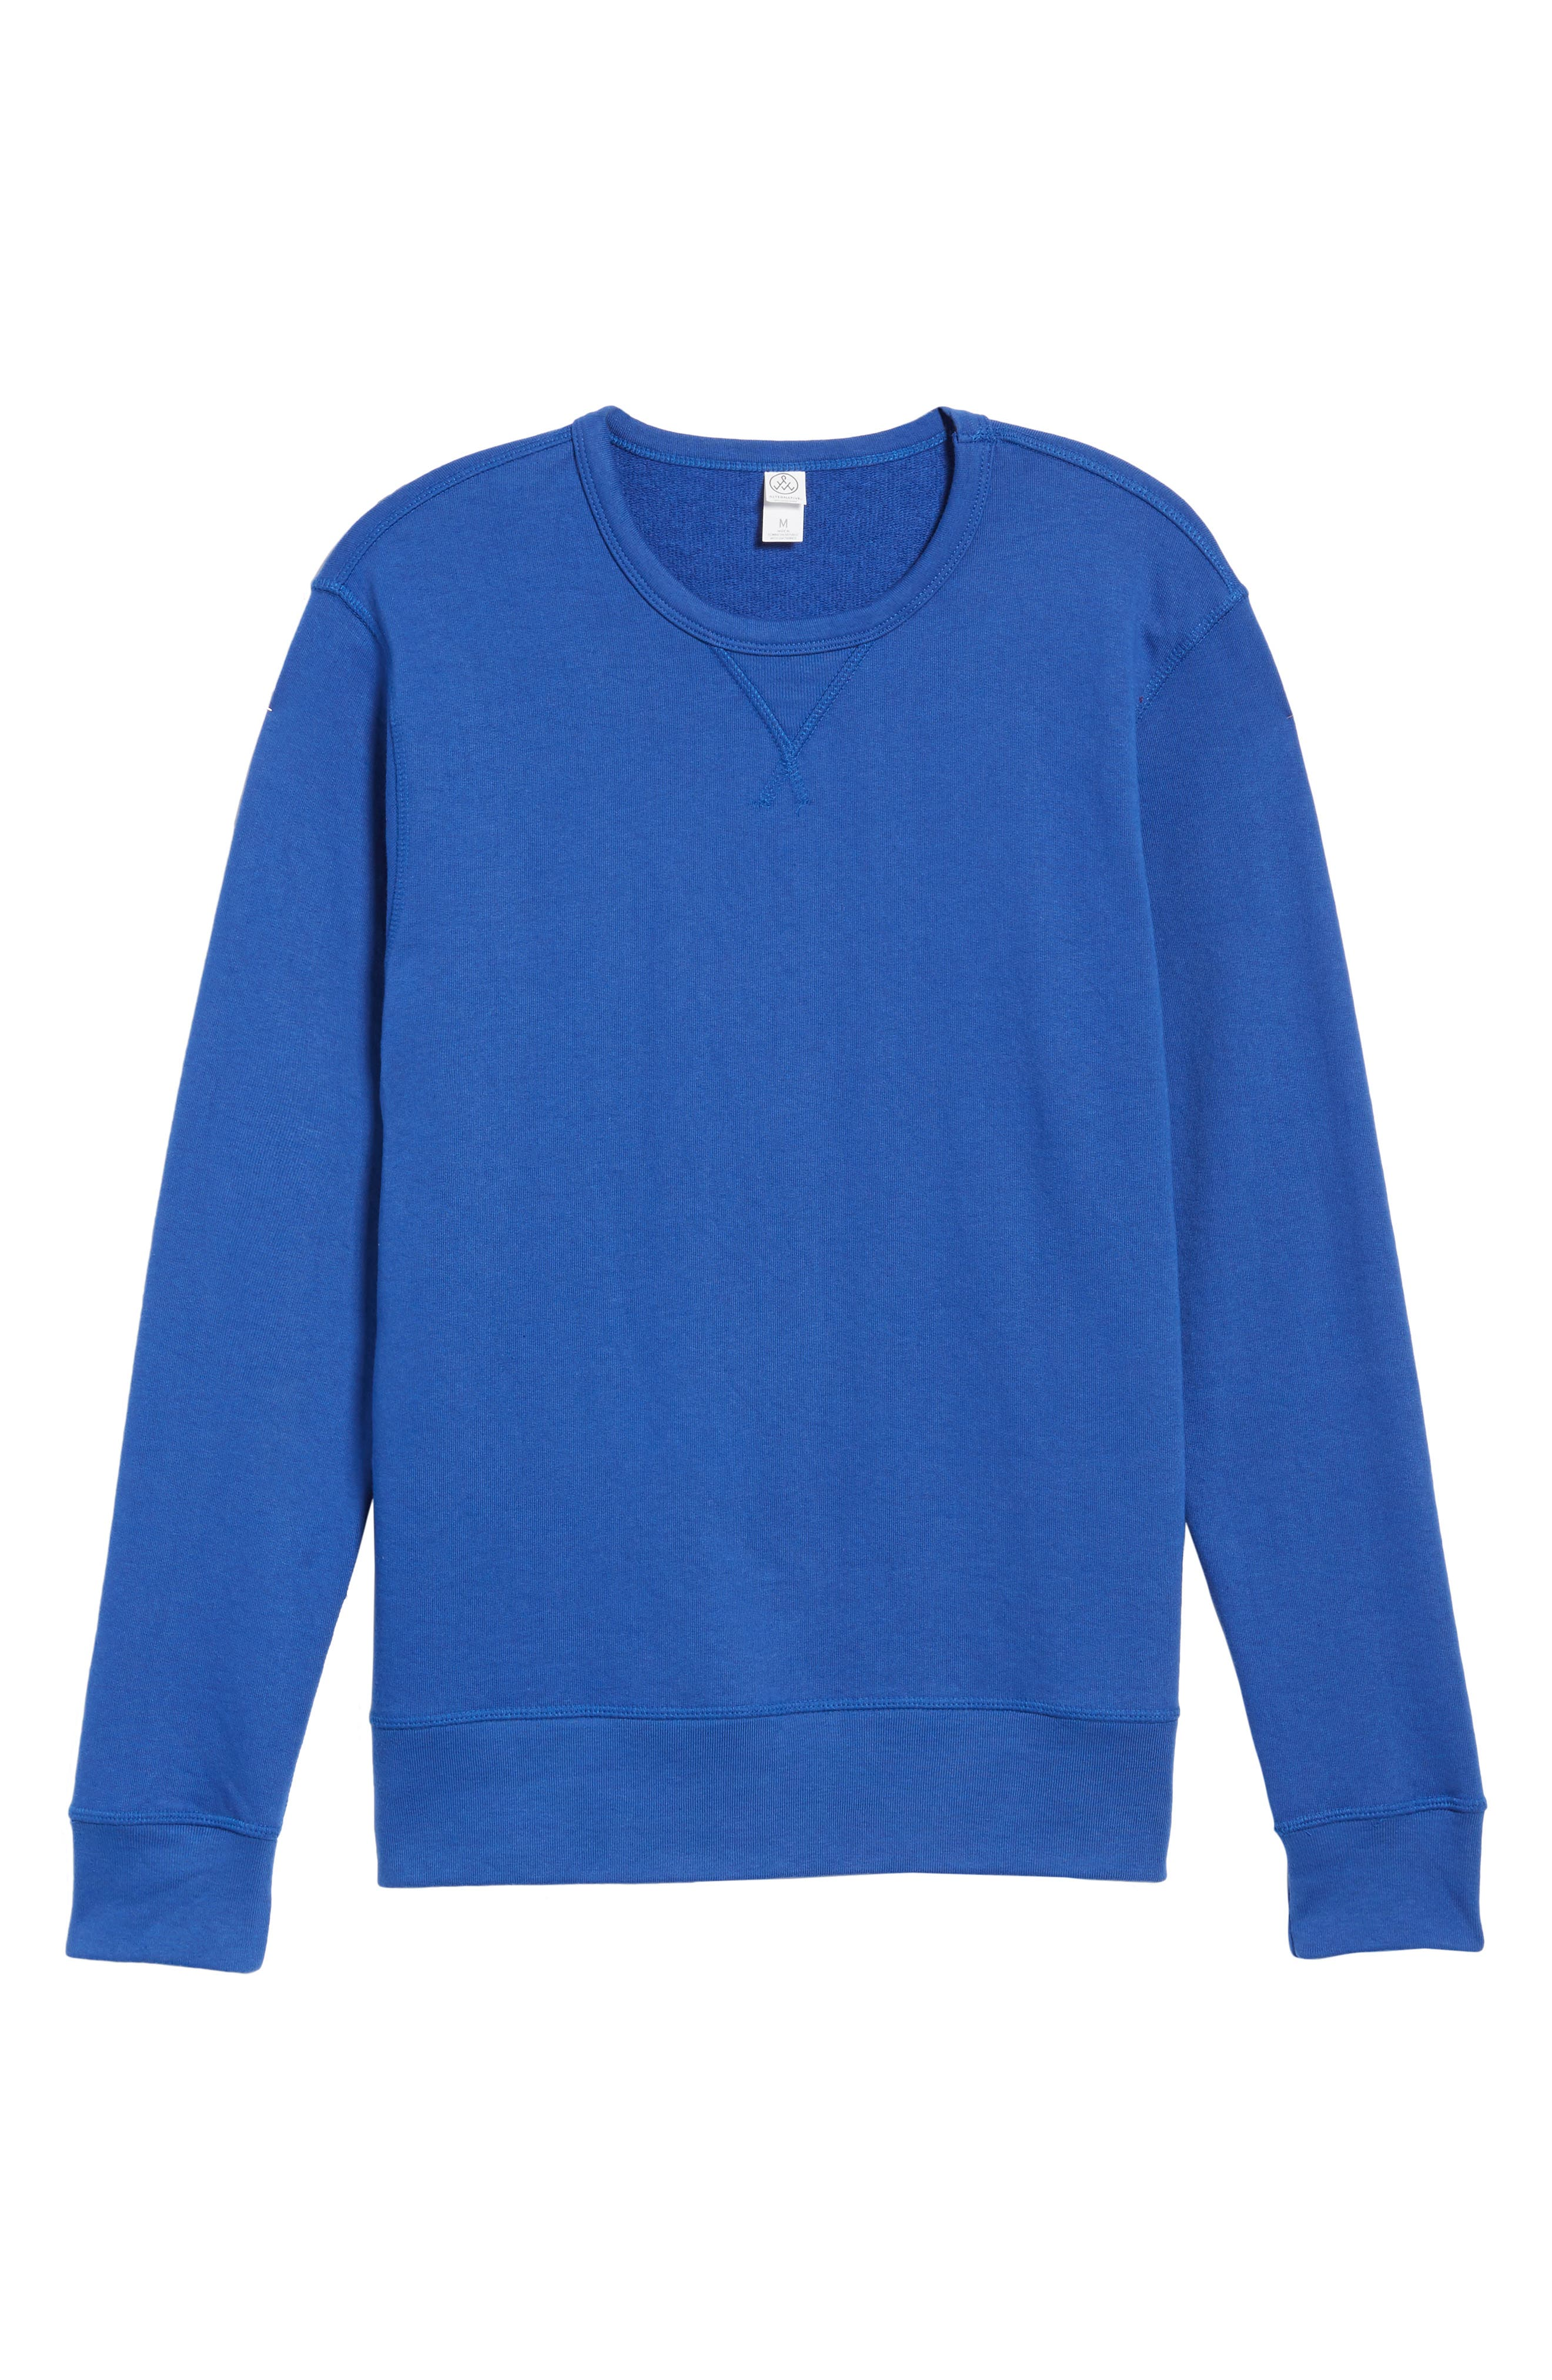 B-Side Reversible Crewneck Sweatshirt,                             Alternate thumbnail 41, color,